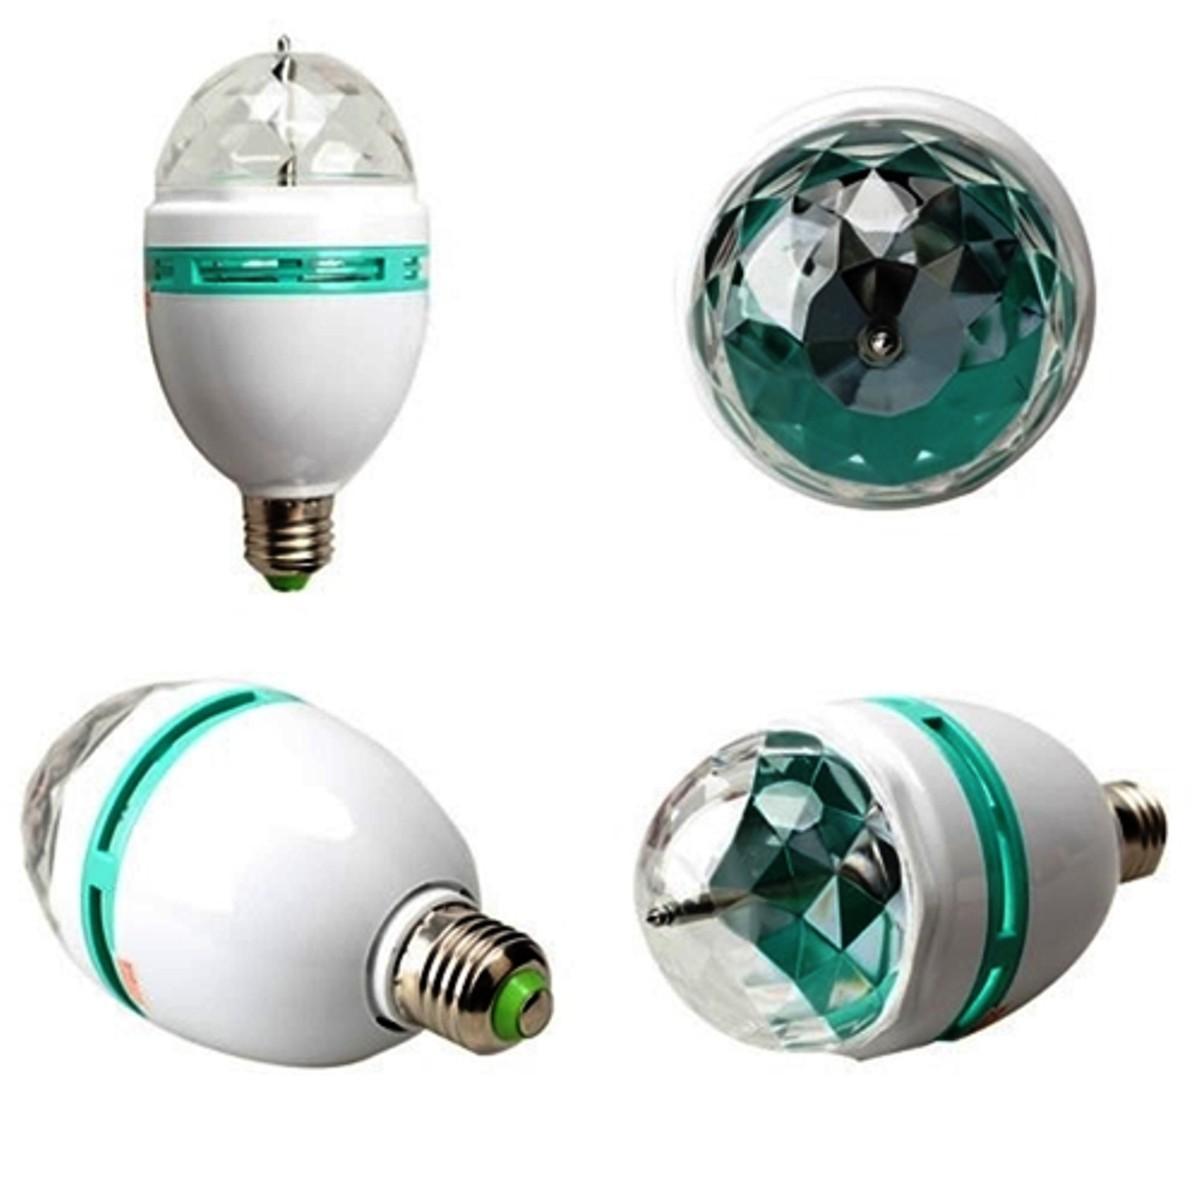 Kit 3 Luminária Lampada Dj Colorido Giratória Bola Maluca